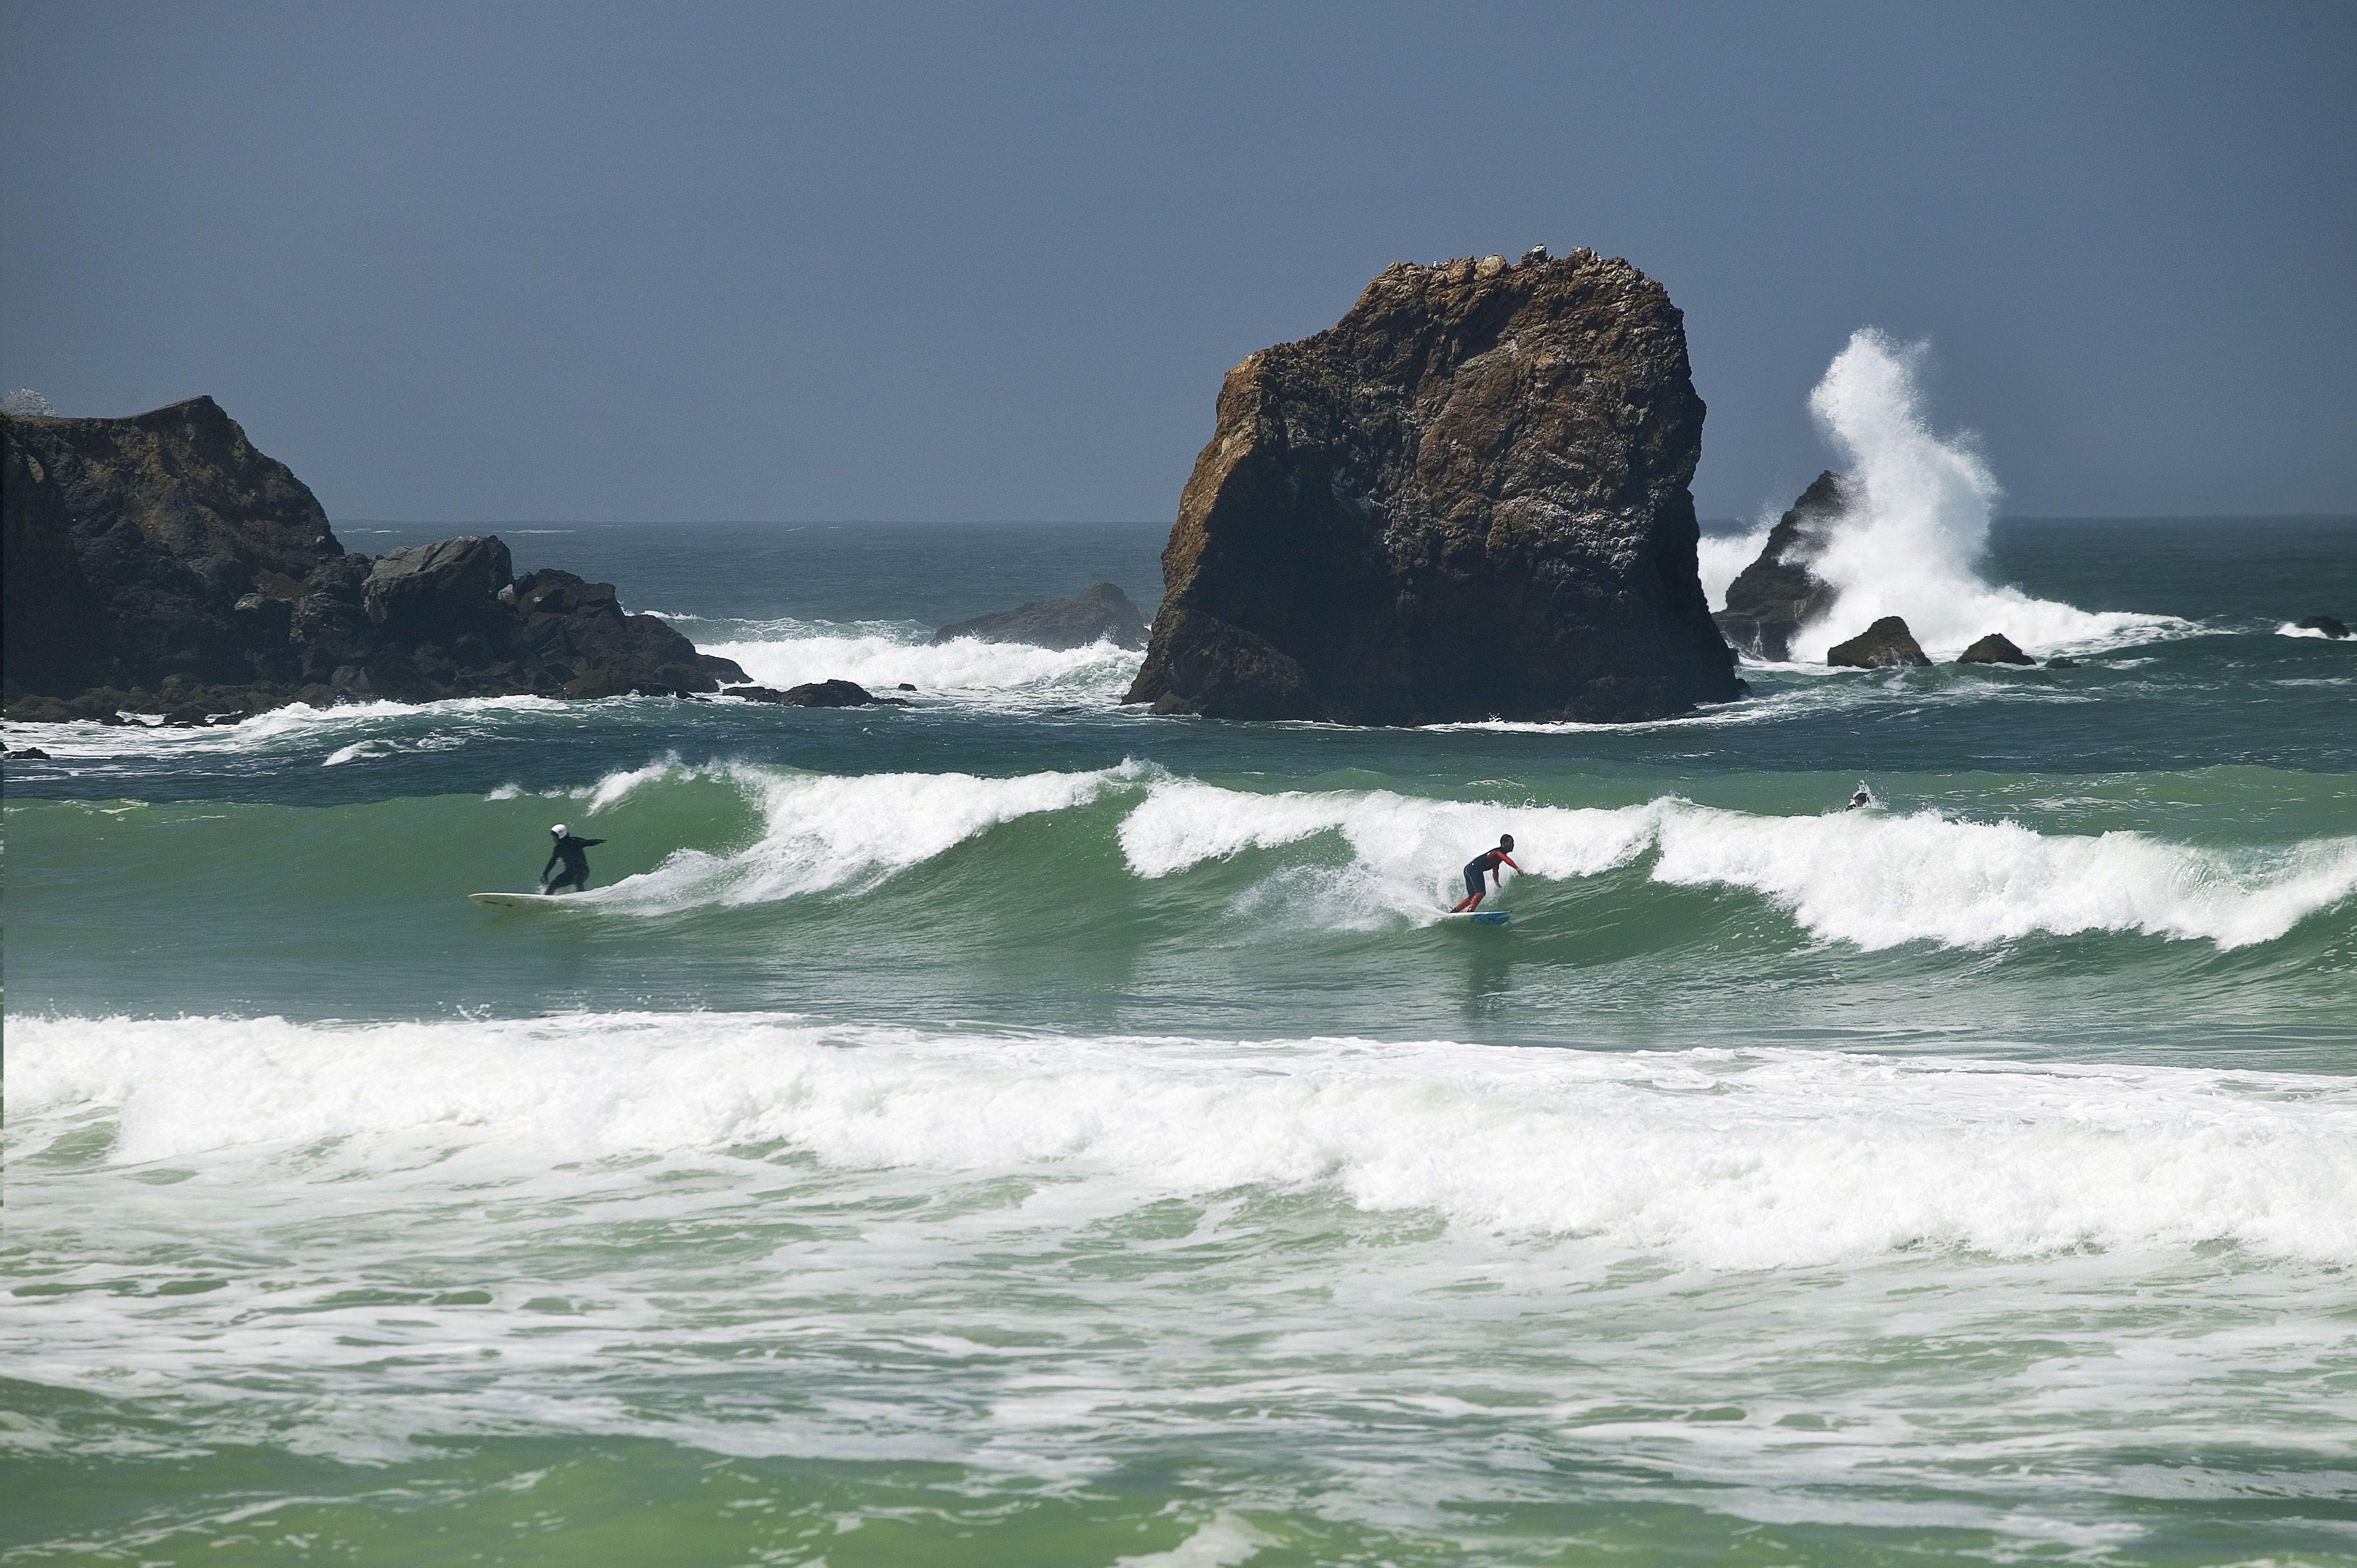 The More Experienced Surfers Ride At Rockaway Beach Rockaway Beach Seaside Towns Gulf Of California